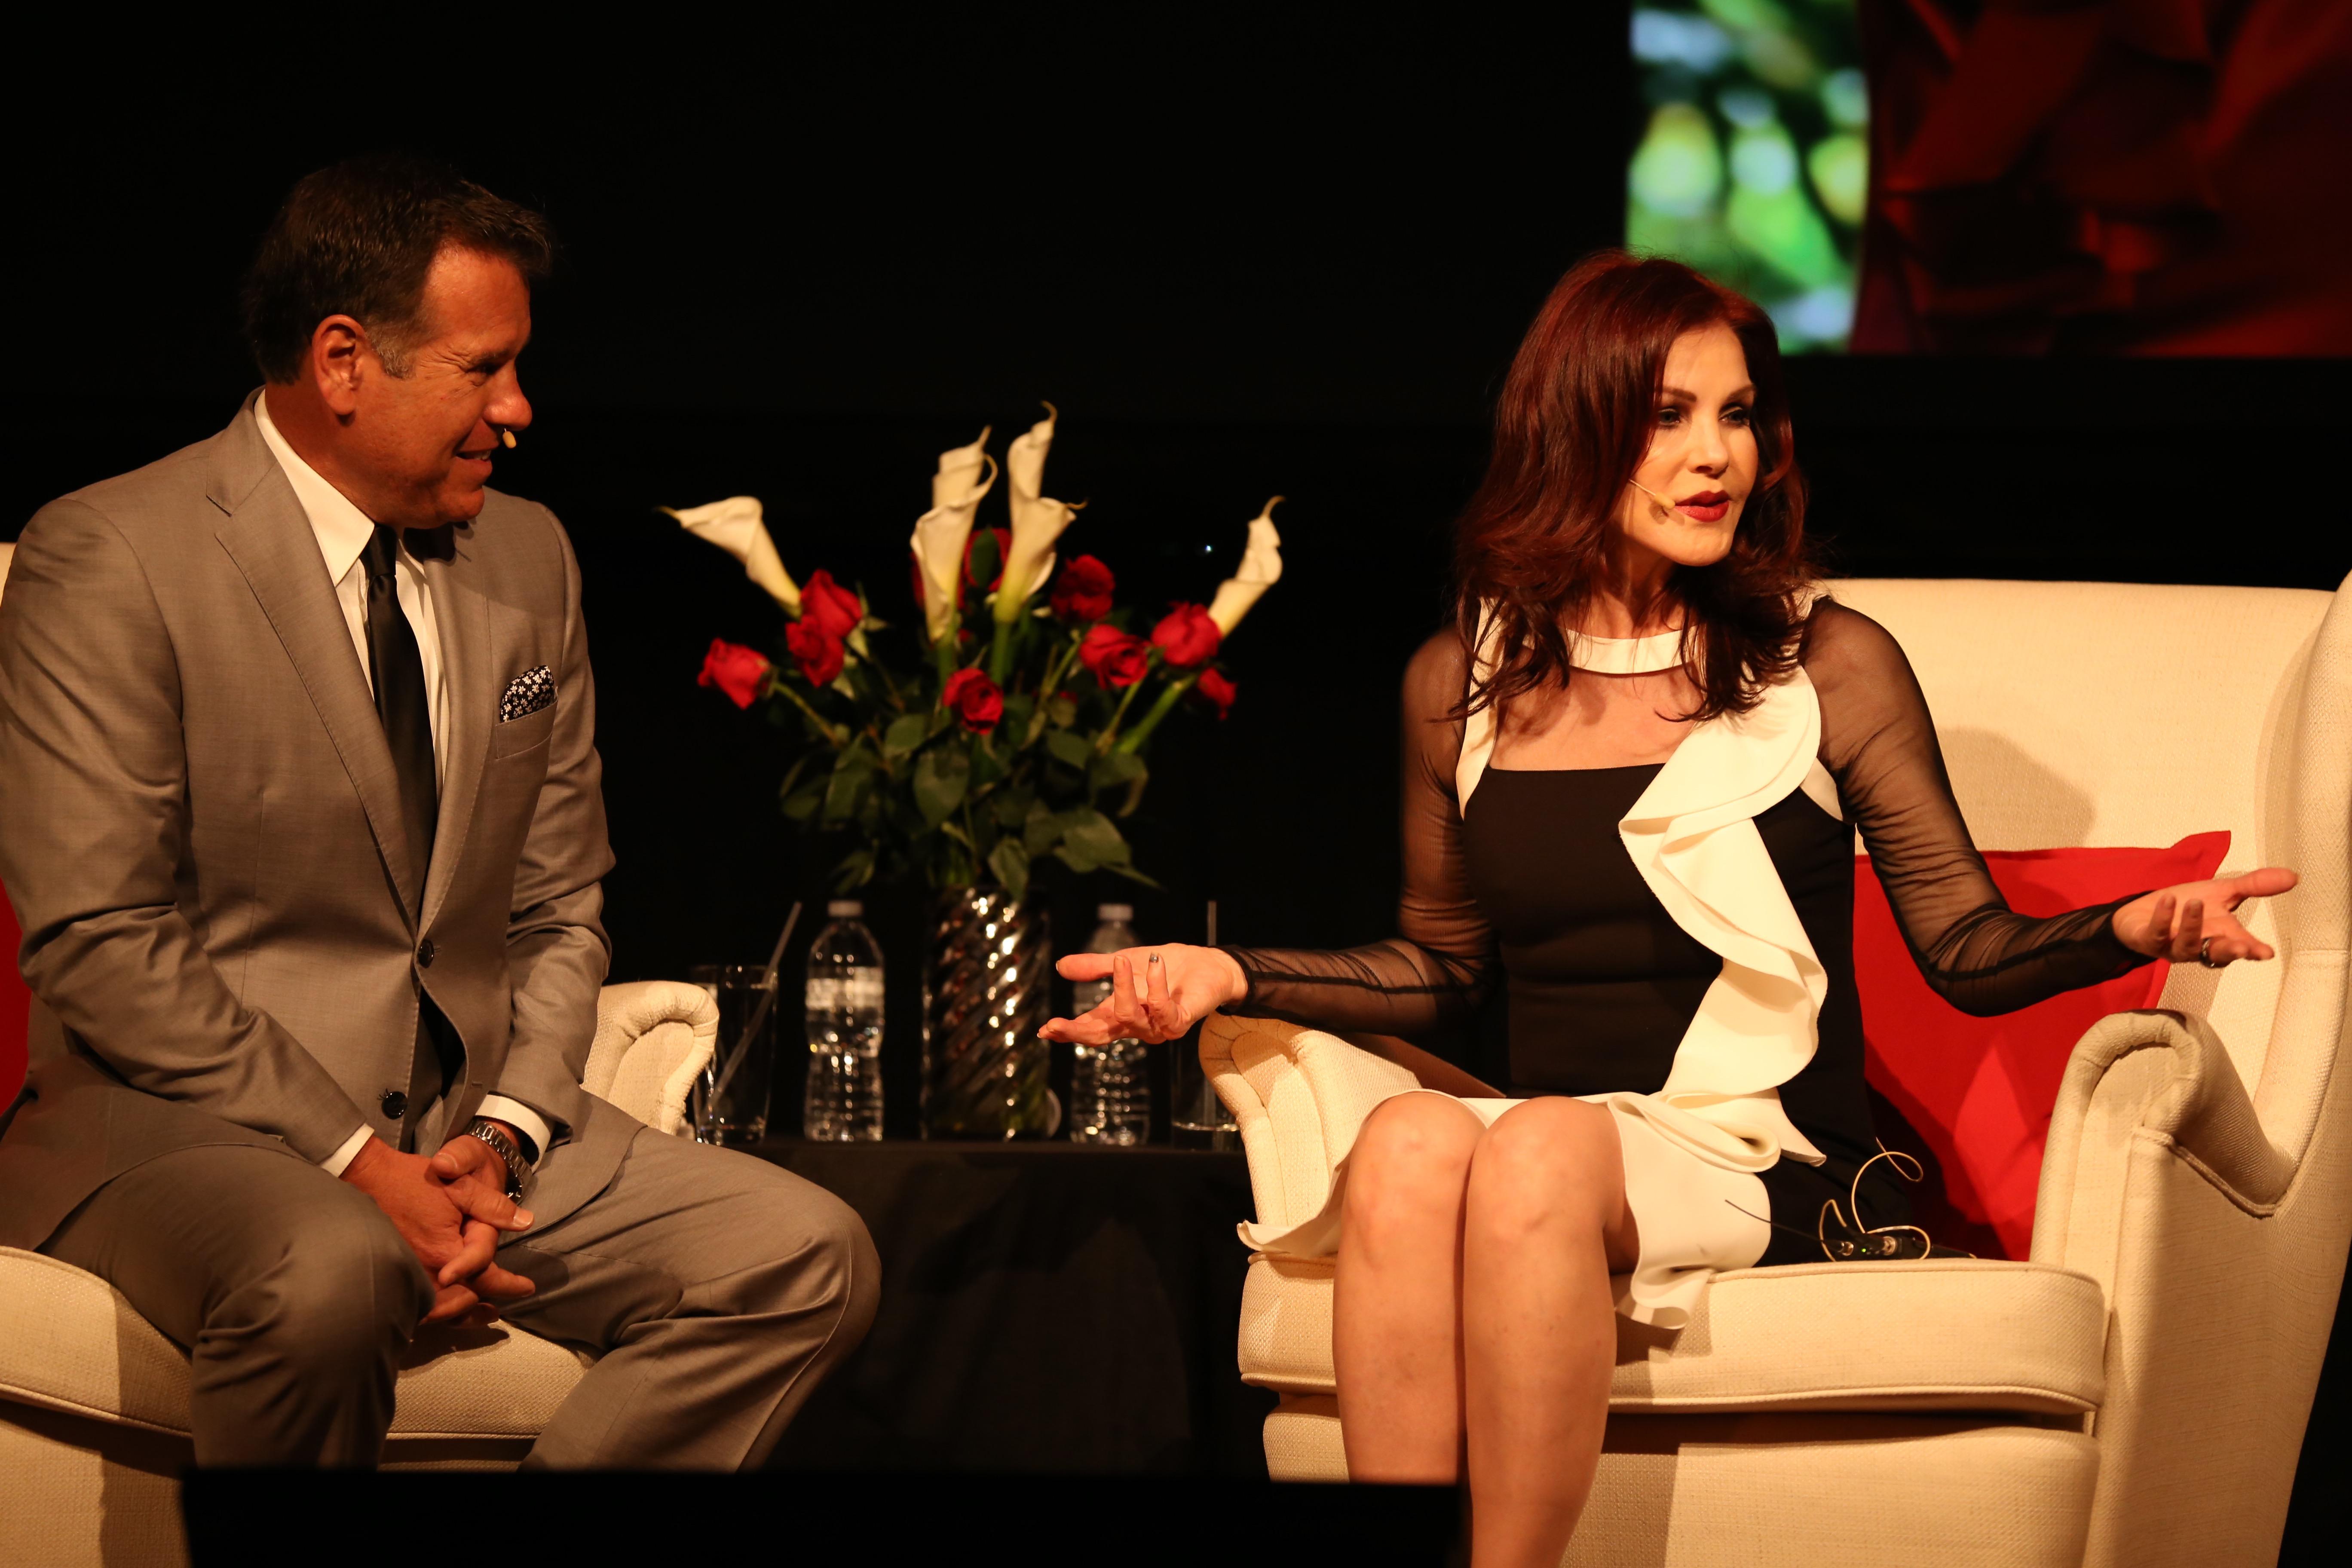 An Evening With Priscilla Presley An Open Conversation